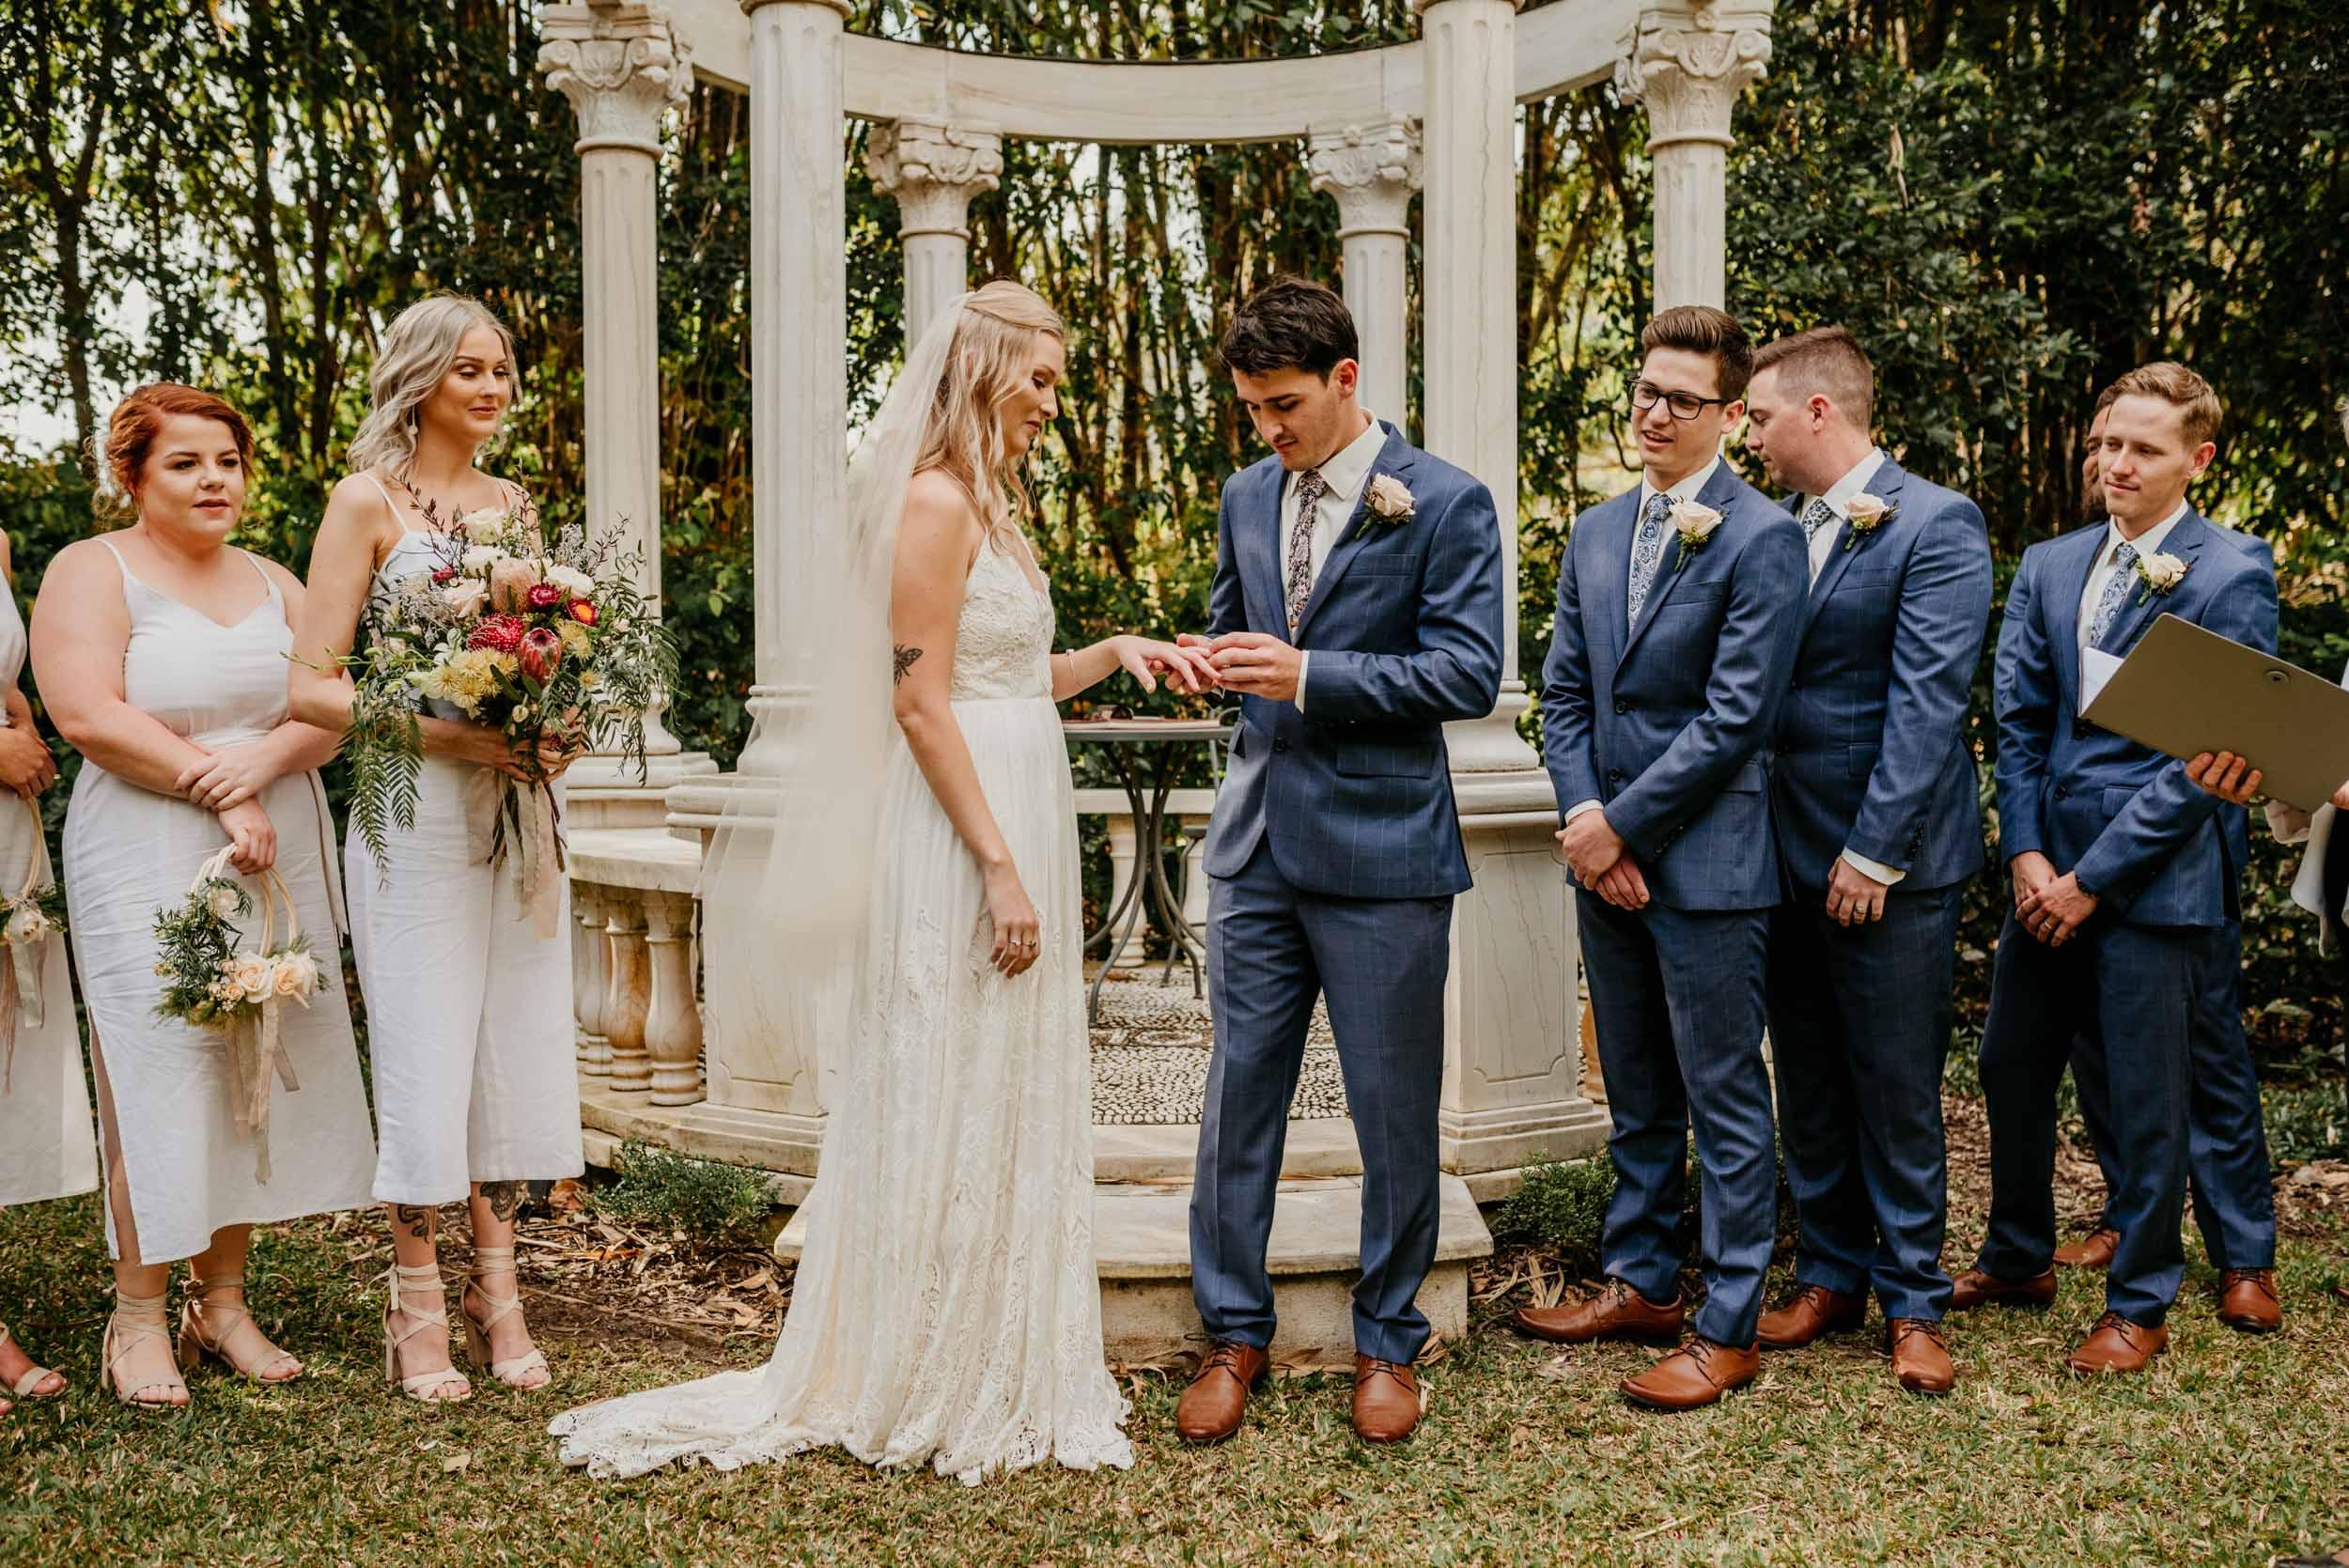 The Raw Photographer - Cairns Wedding Photographer - Laloli - Cairns Garden Wedding - Wedding Dress-43.jpg